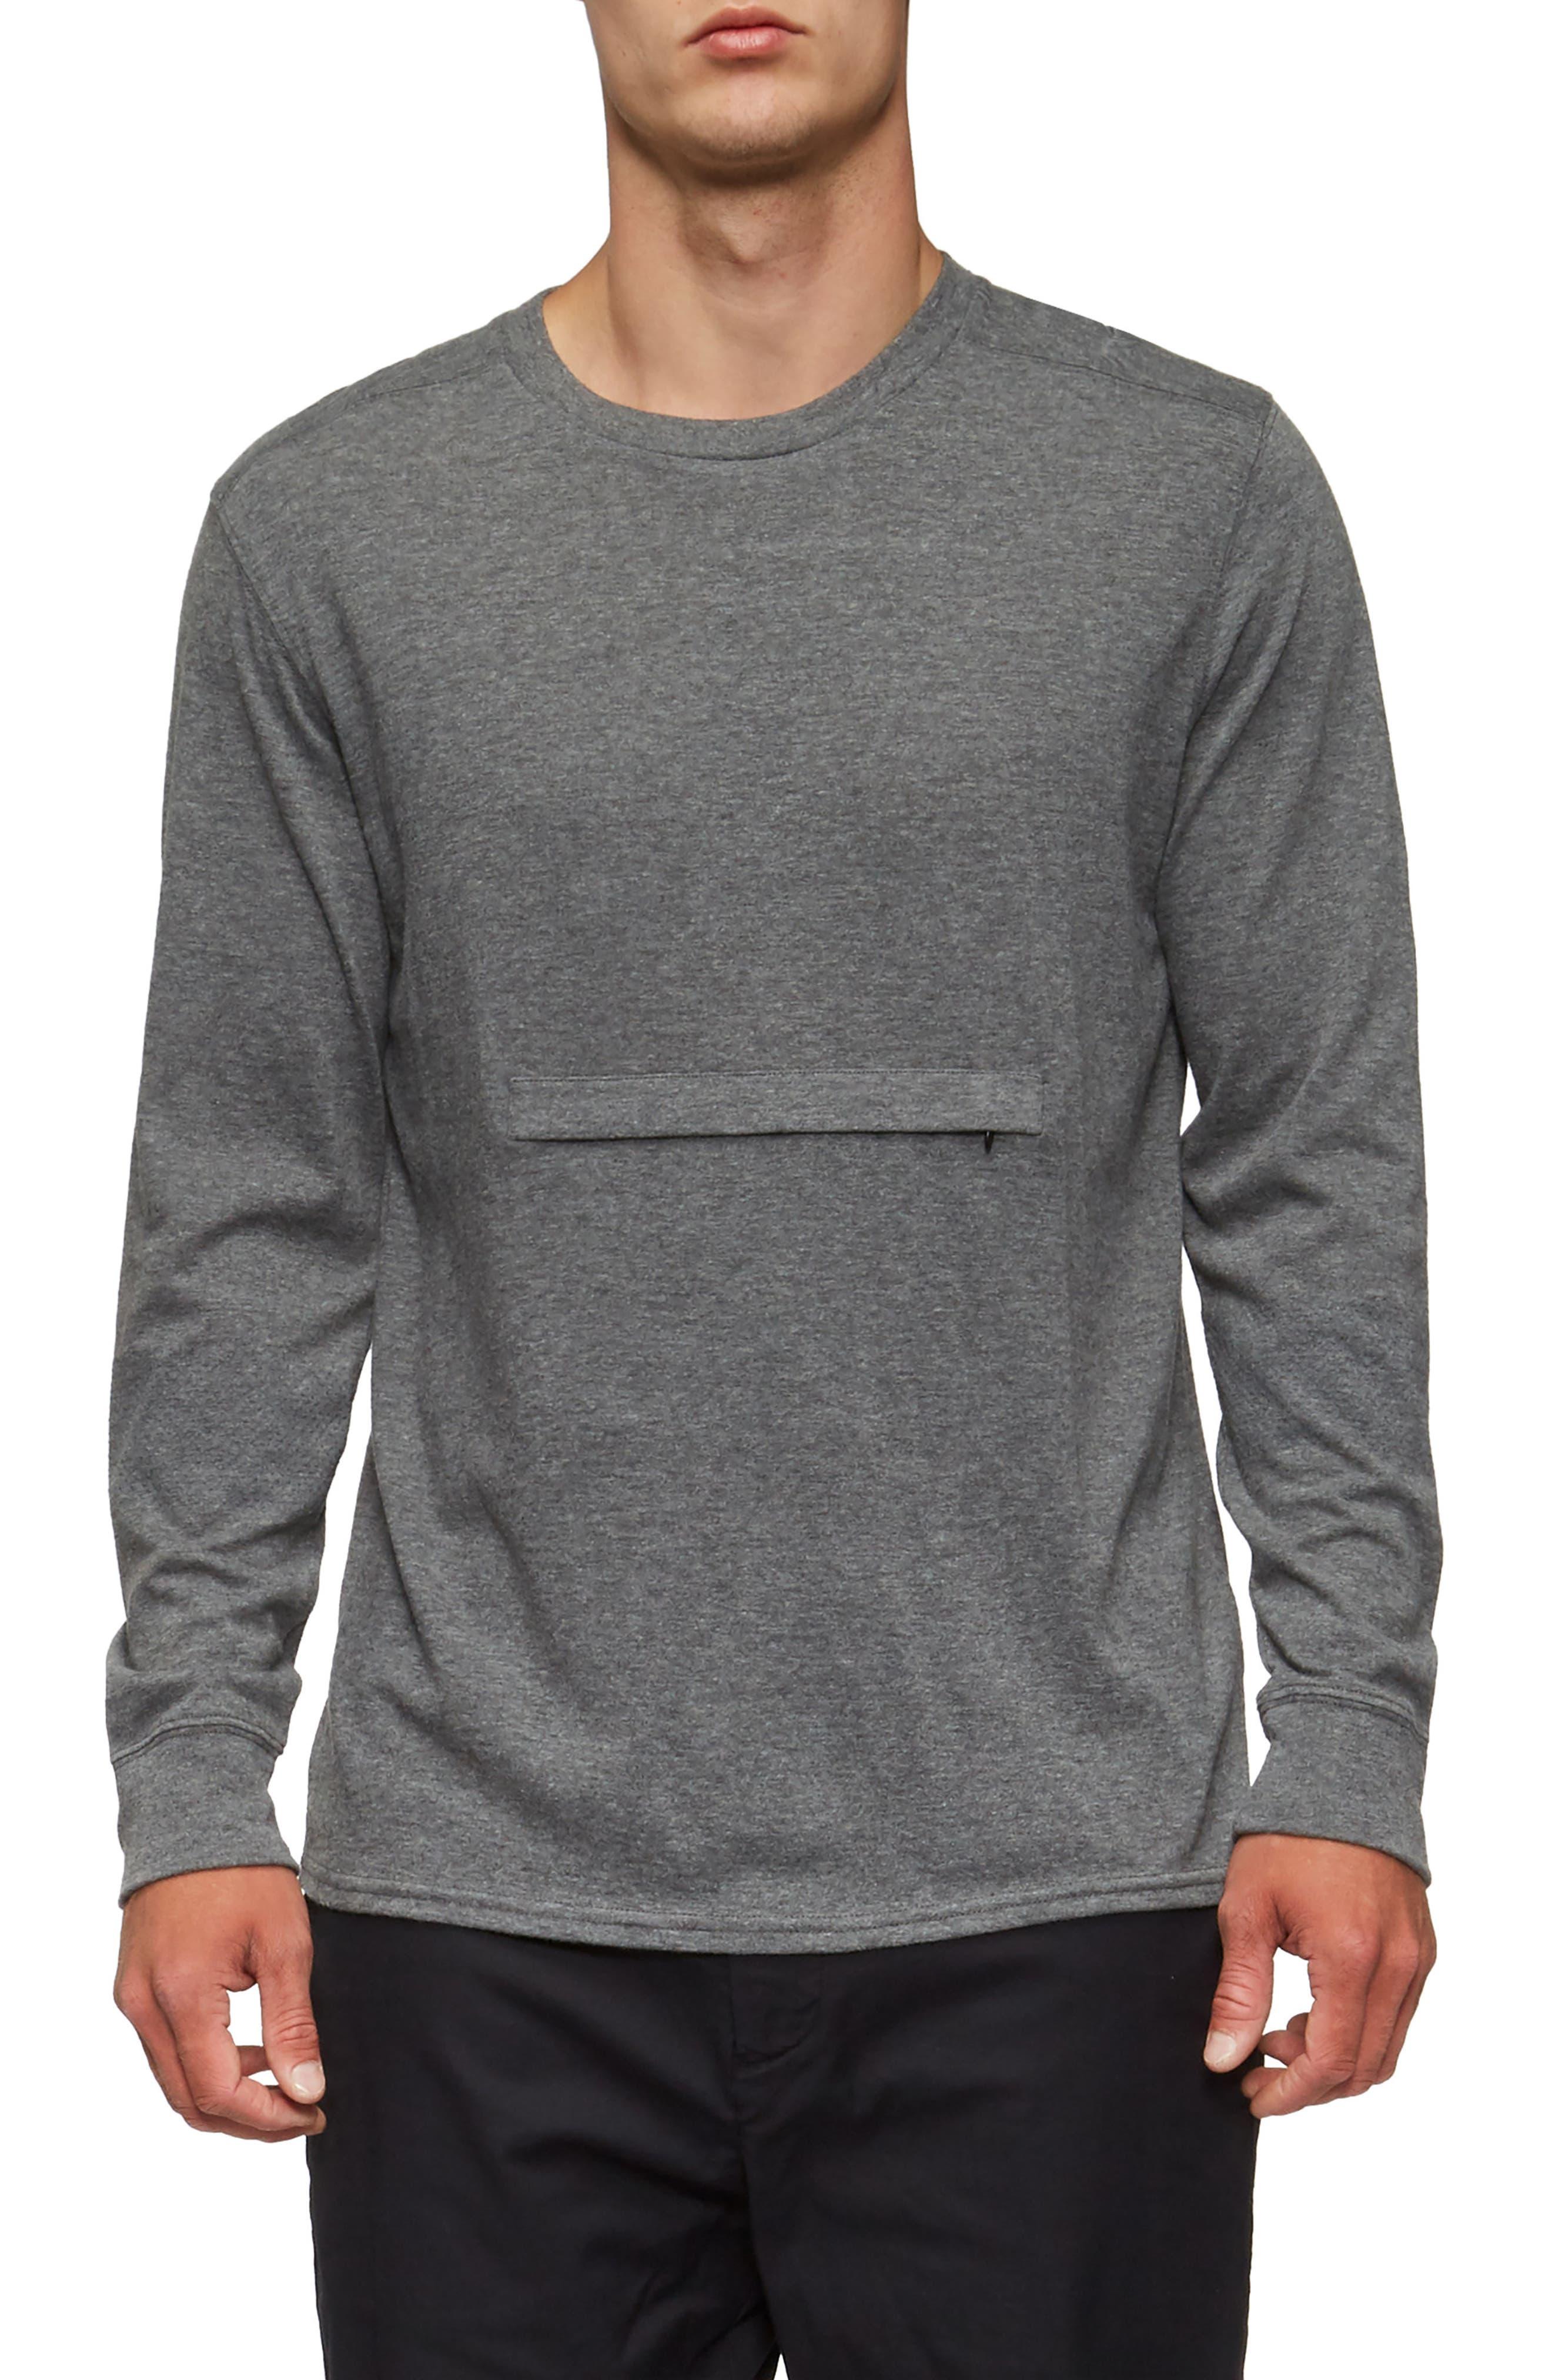 Alternate Image 1 Selected - TAVIK Lowell Long Sleeve T-Shirt